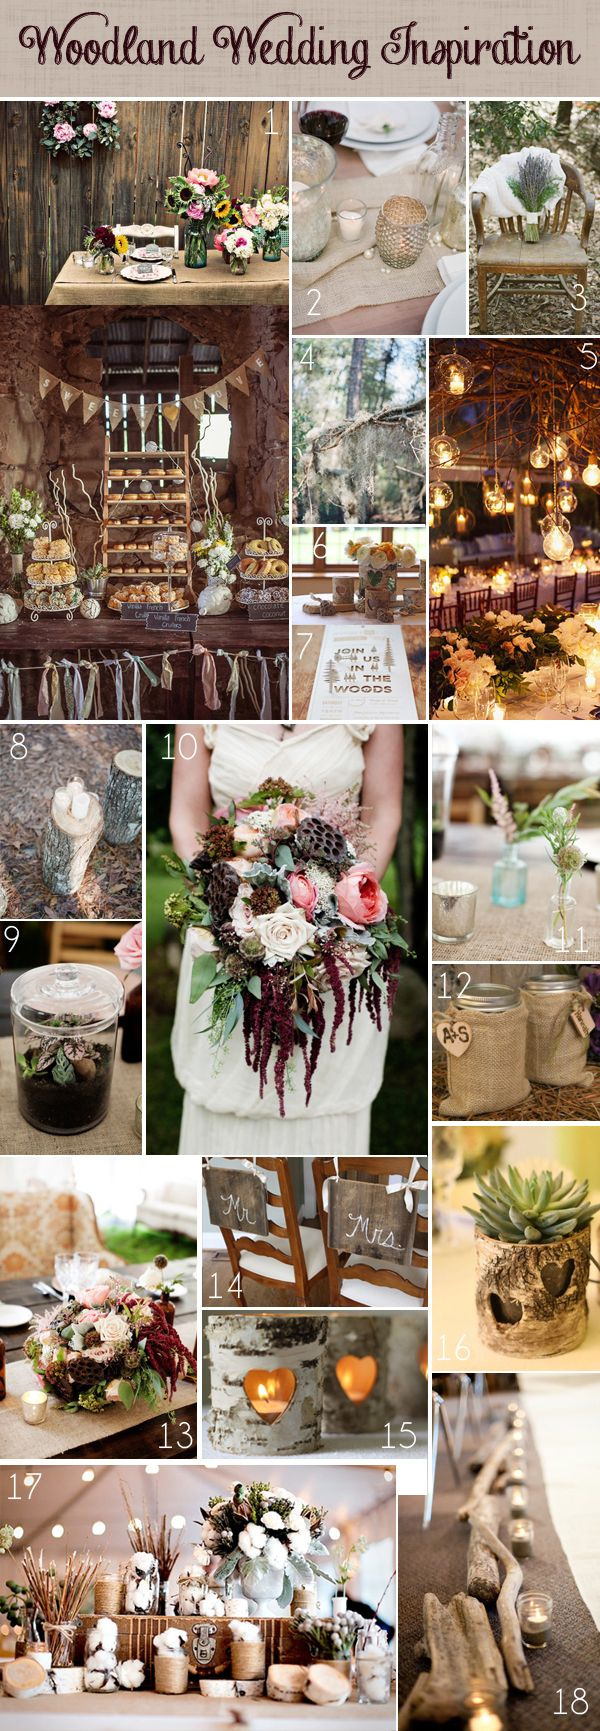 Wedding decorations natural  Woodland Wedding Ideas  Wedding tables Table decorations and